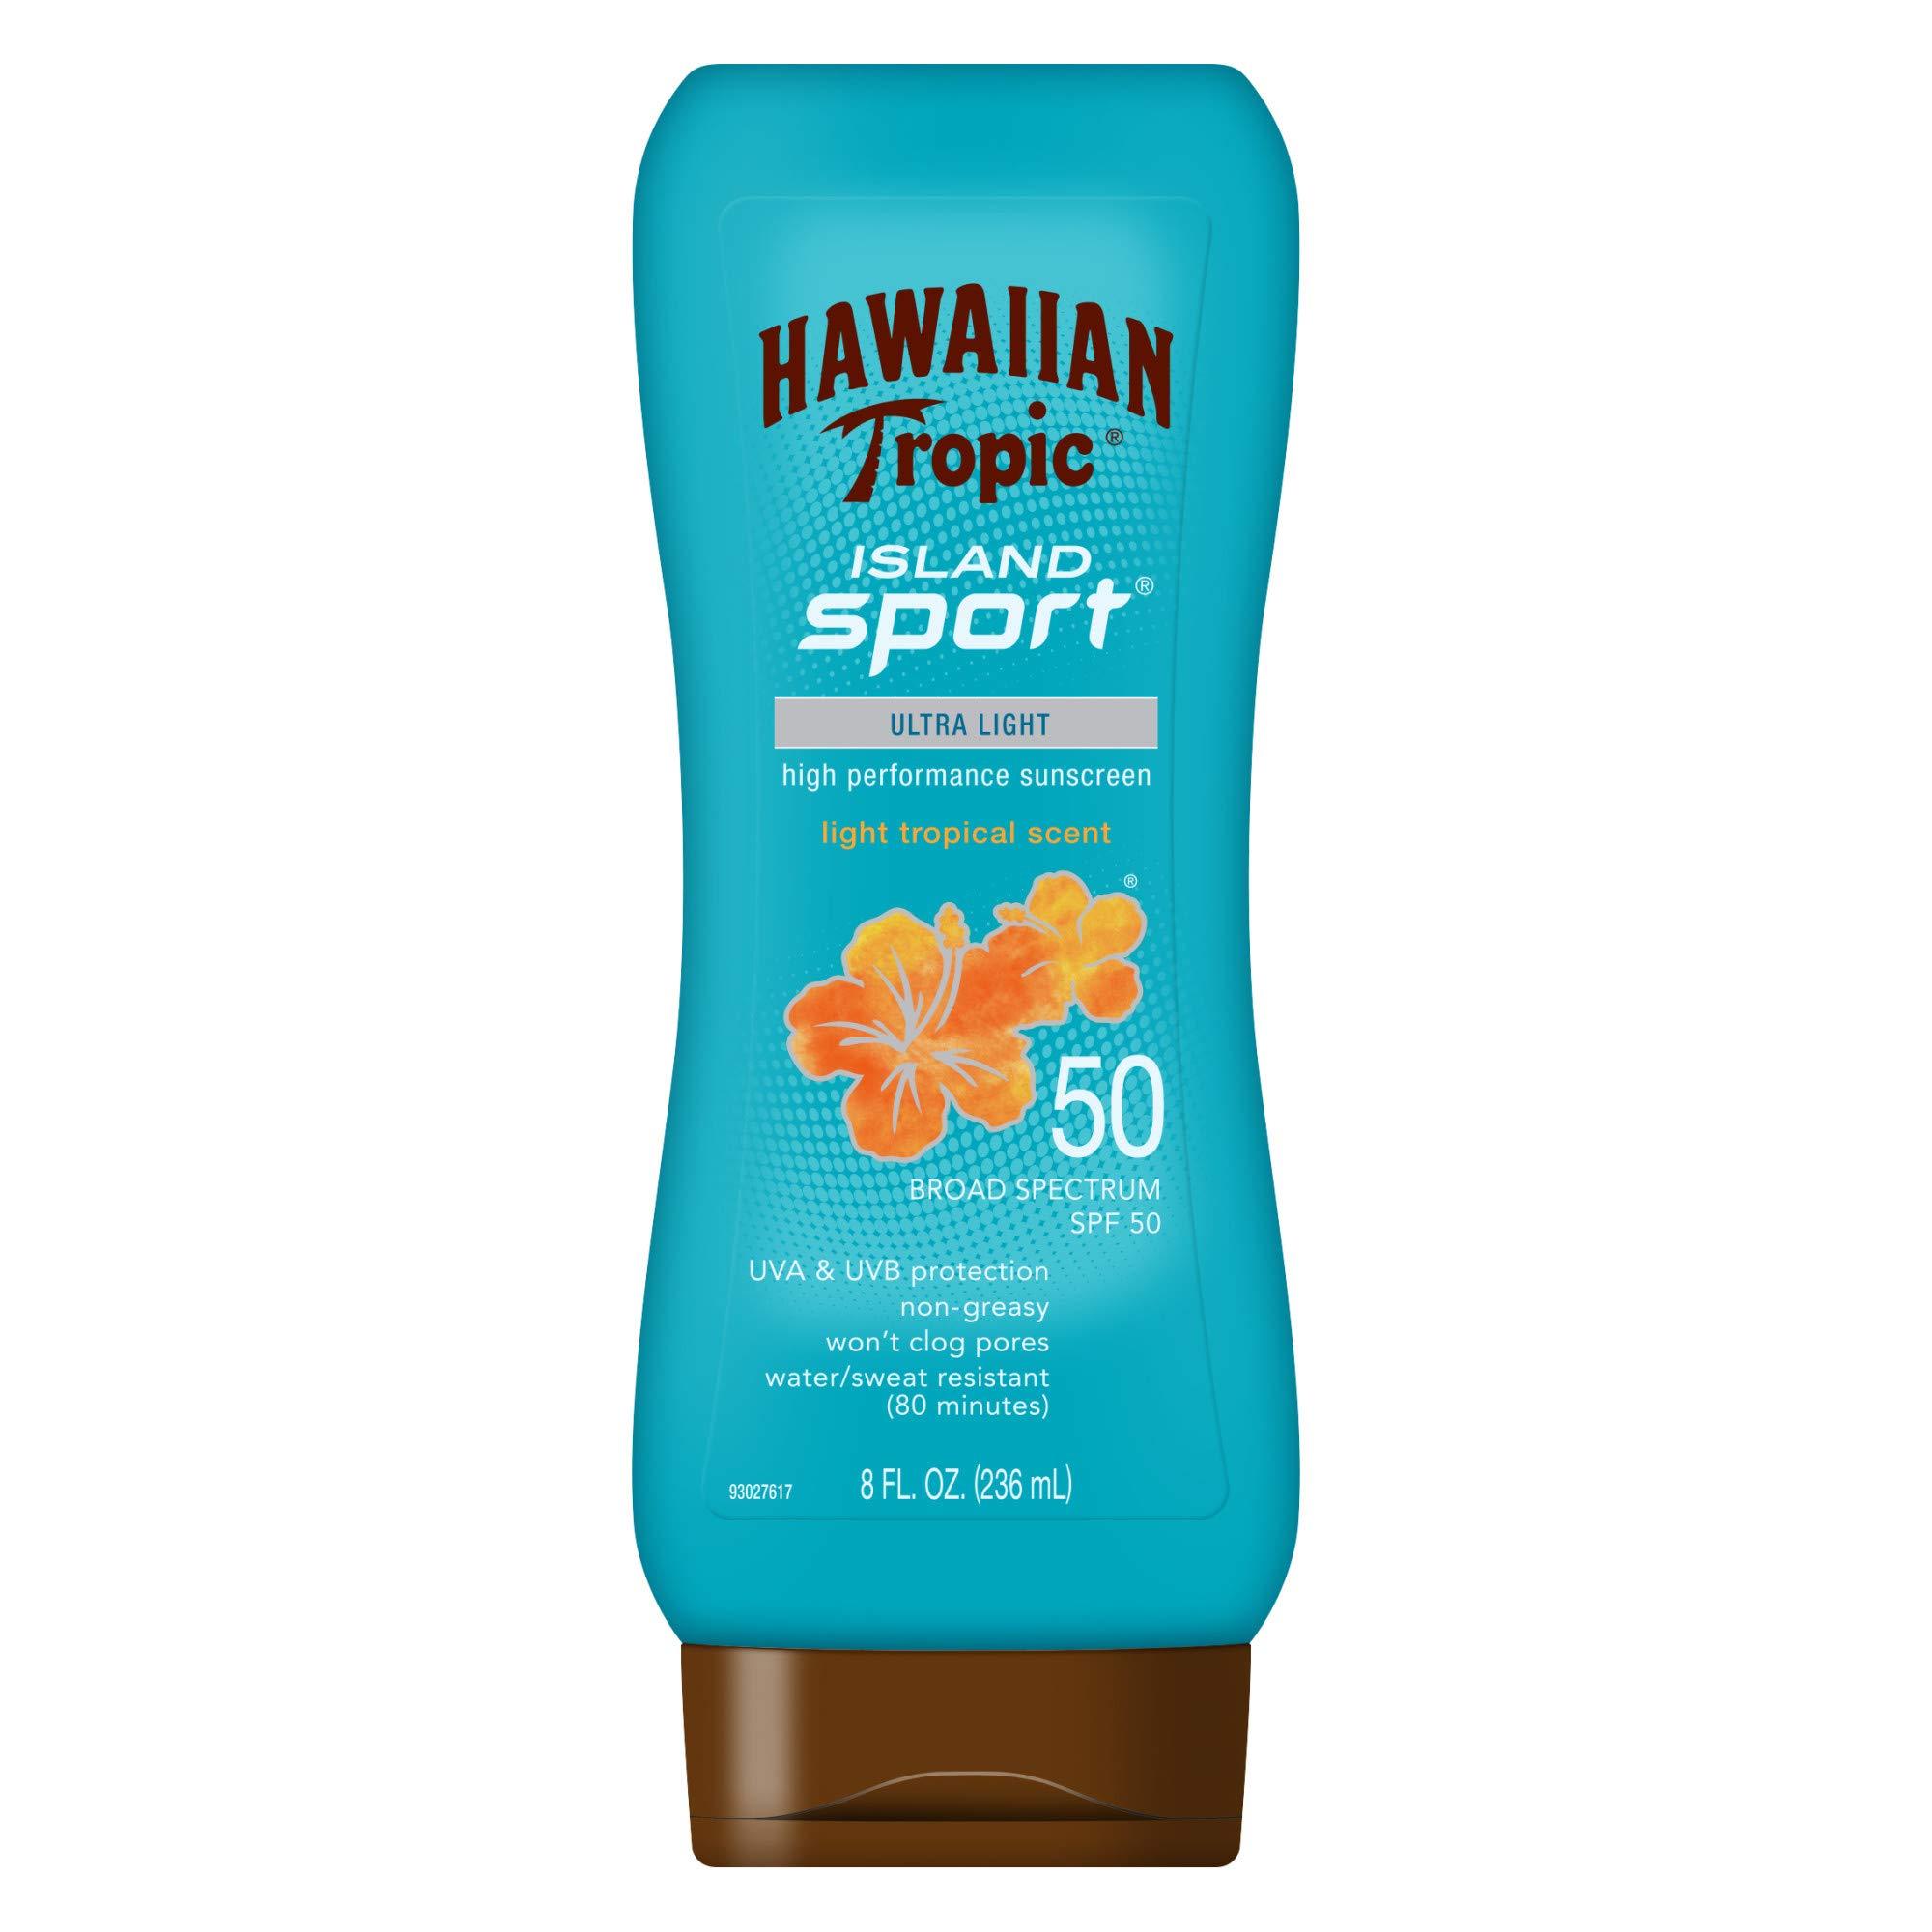 Hawaiian Tropic Island Spectrum Sunscreen